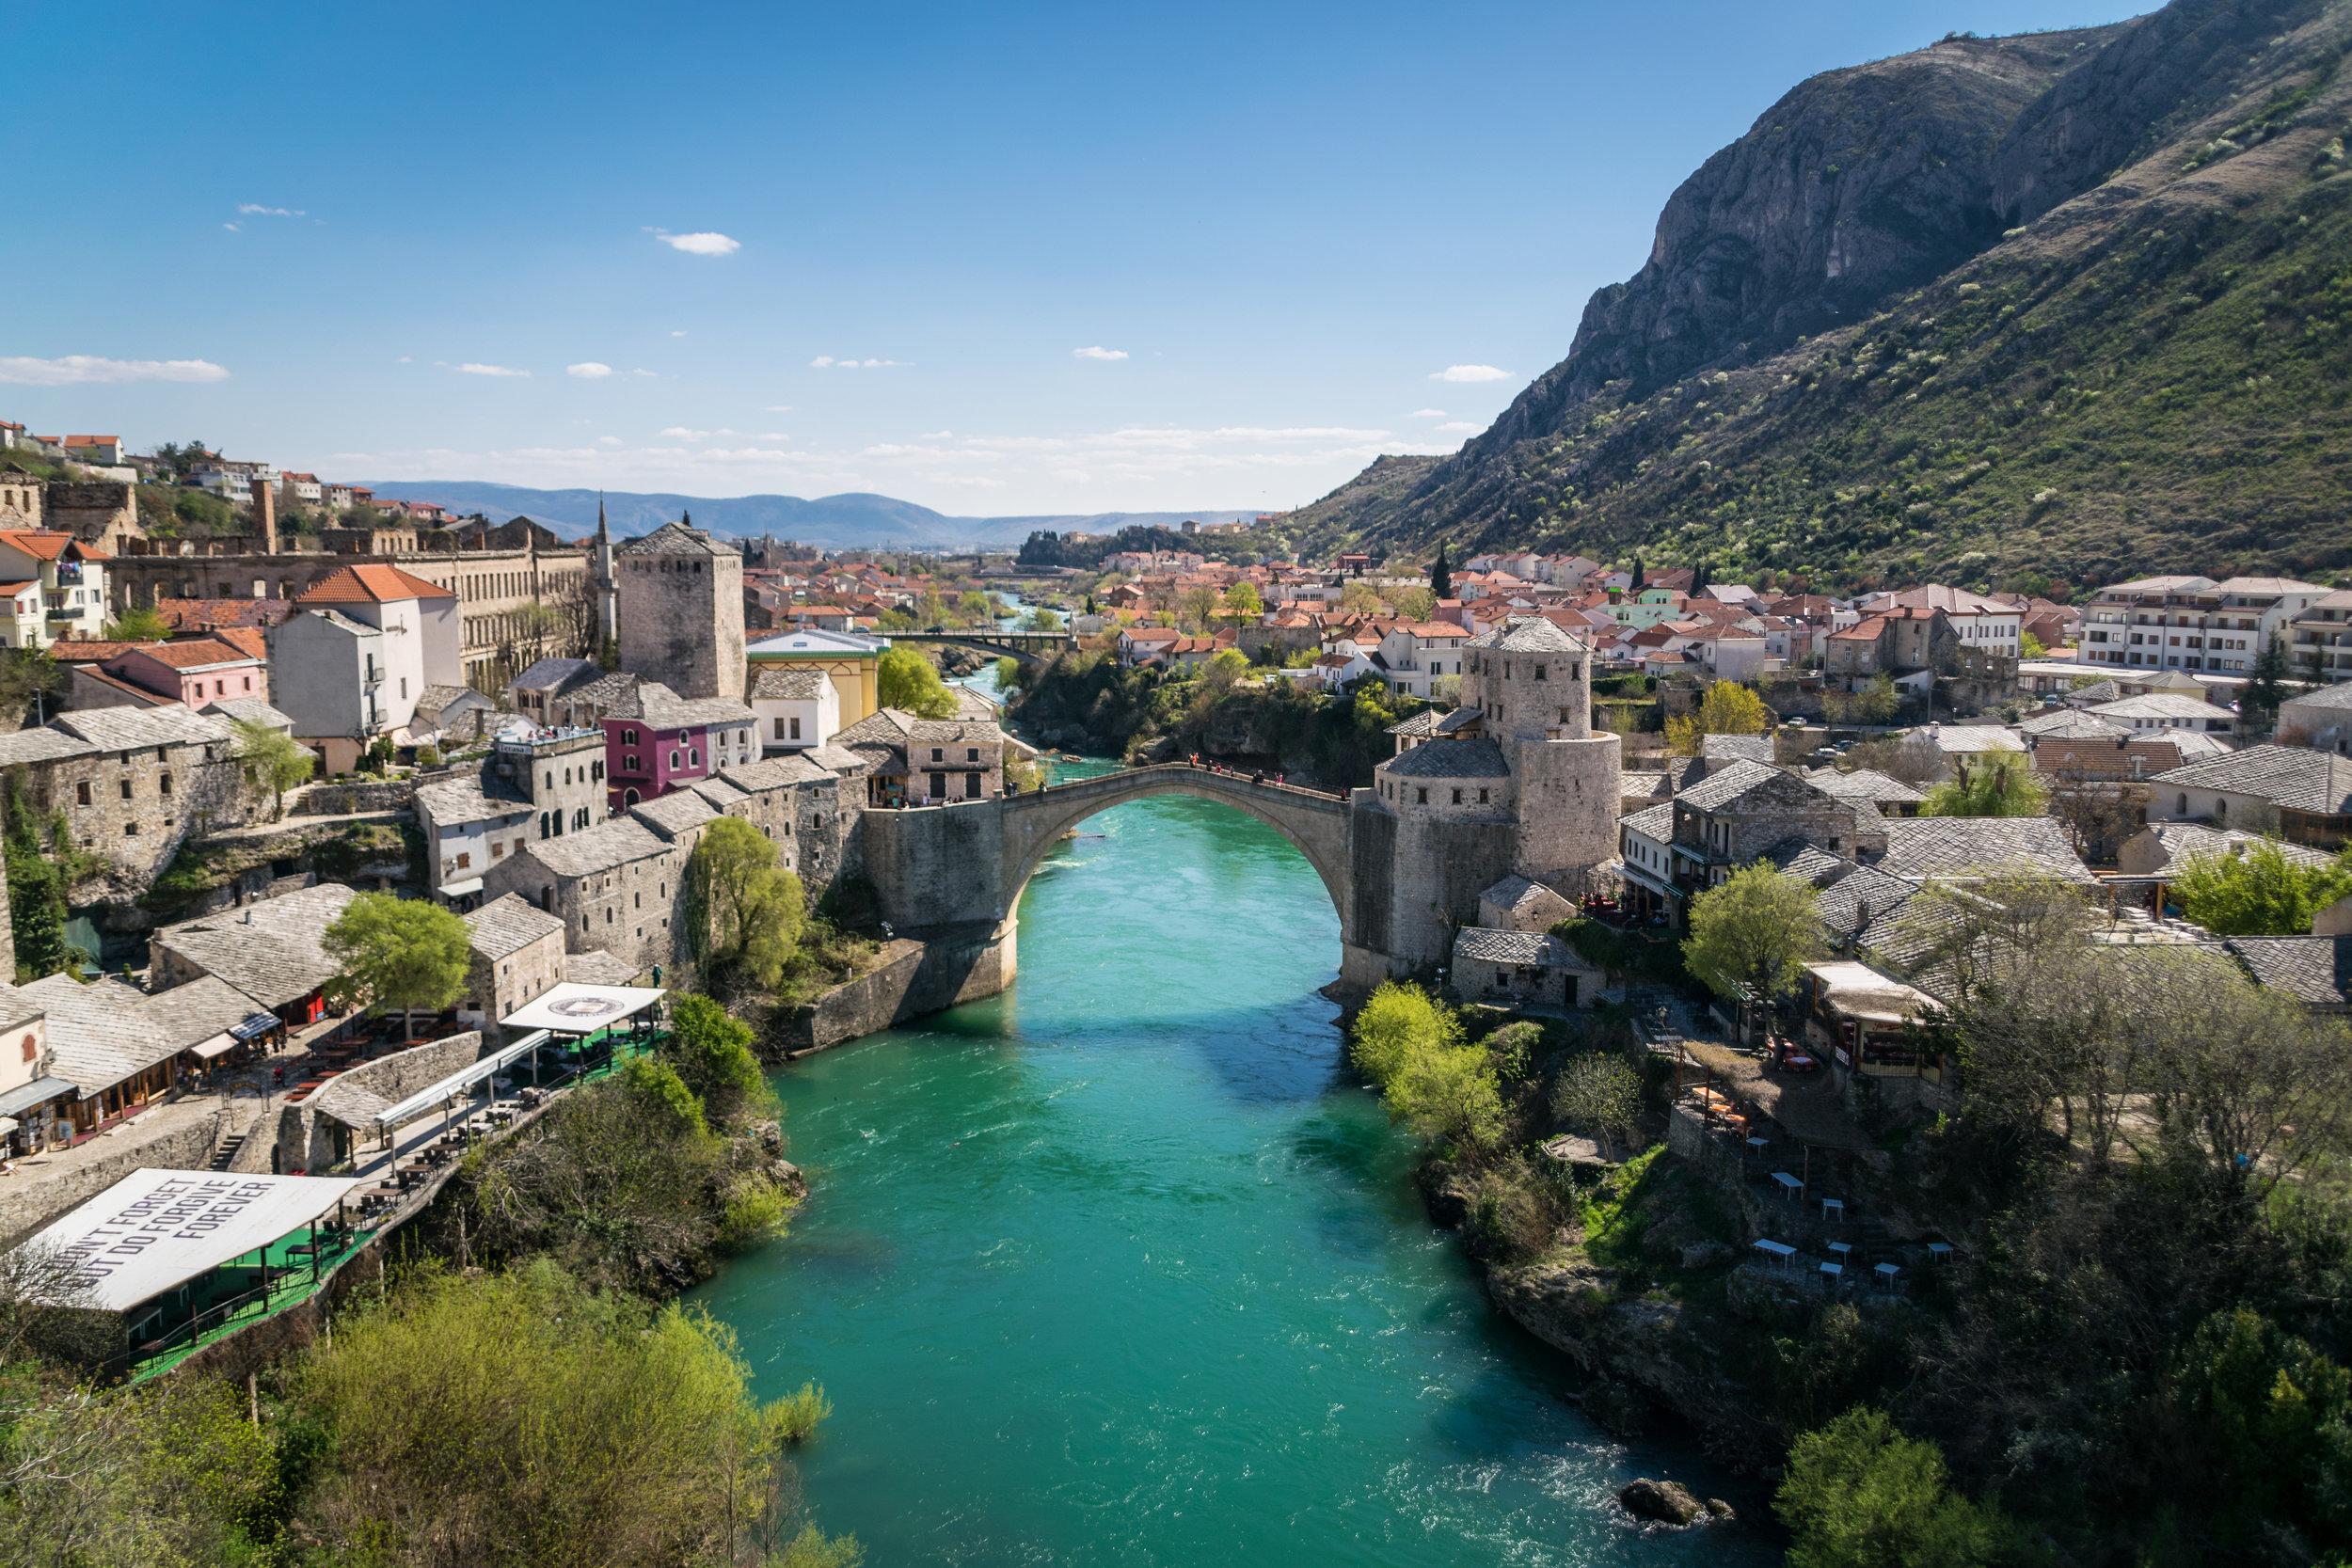 BiH_Mostar+old+town-1.jpg